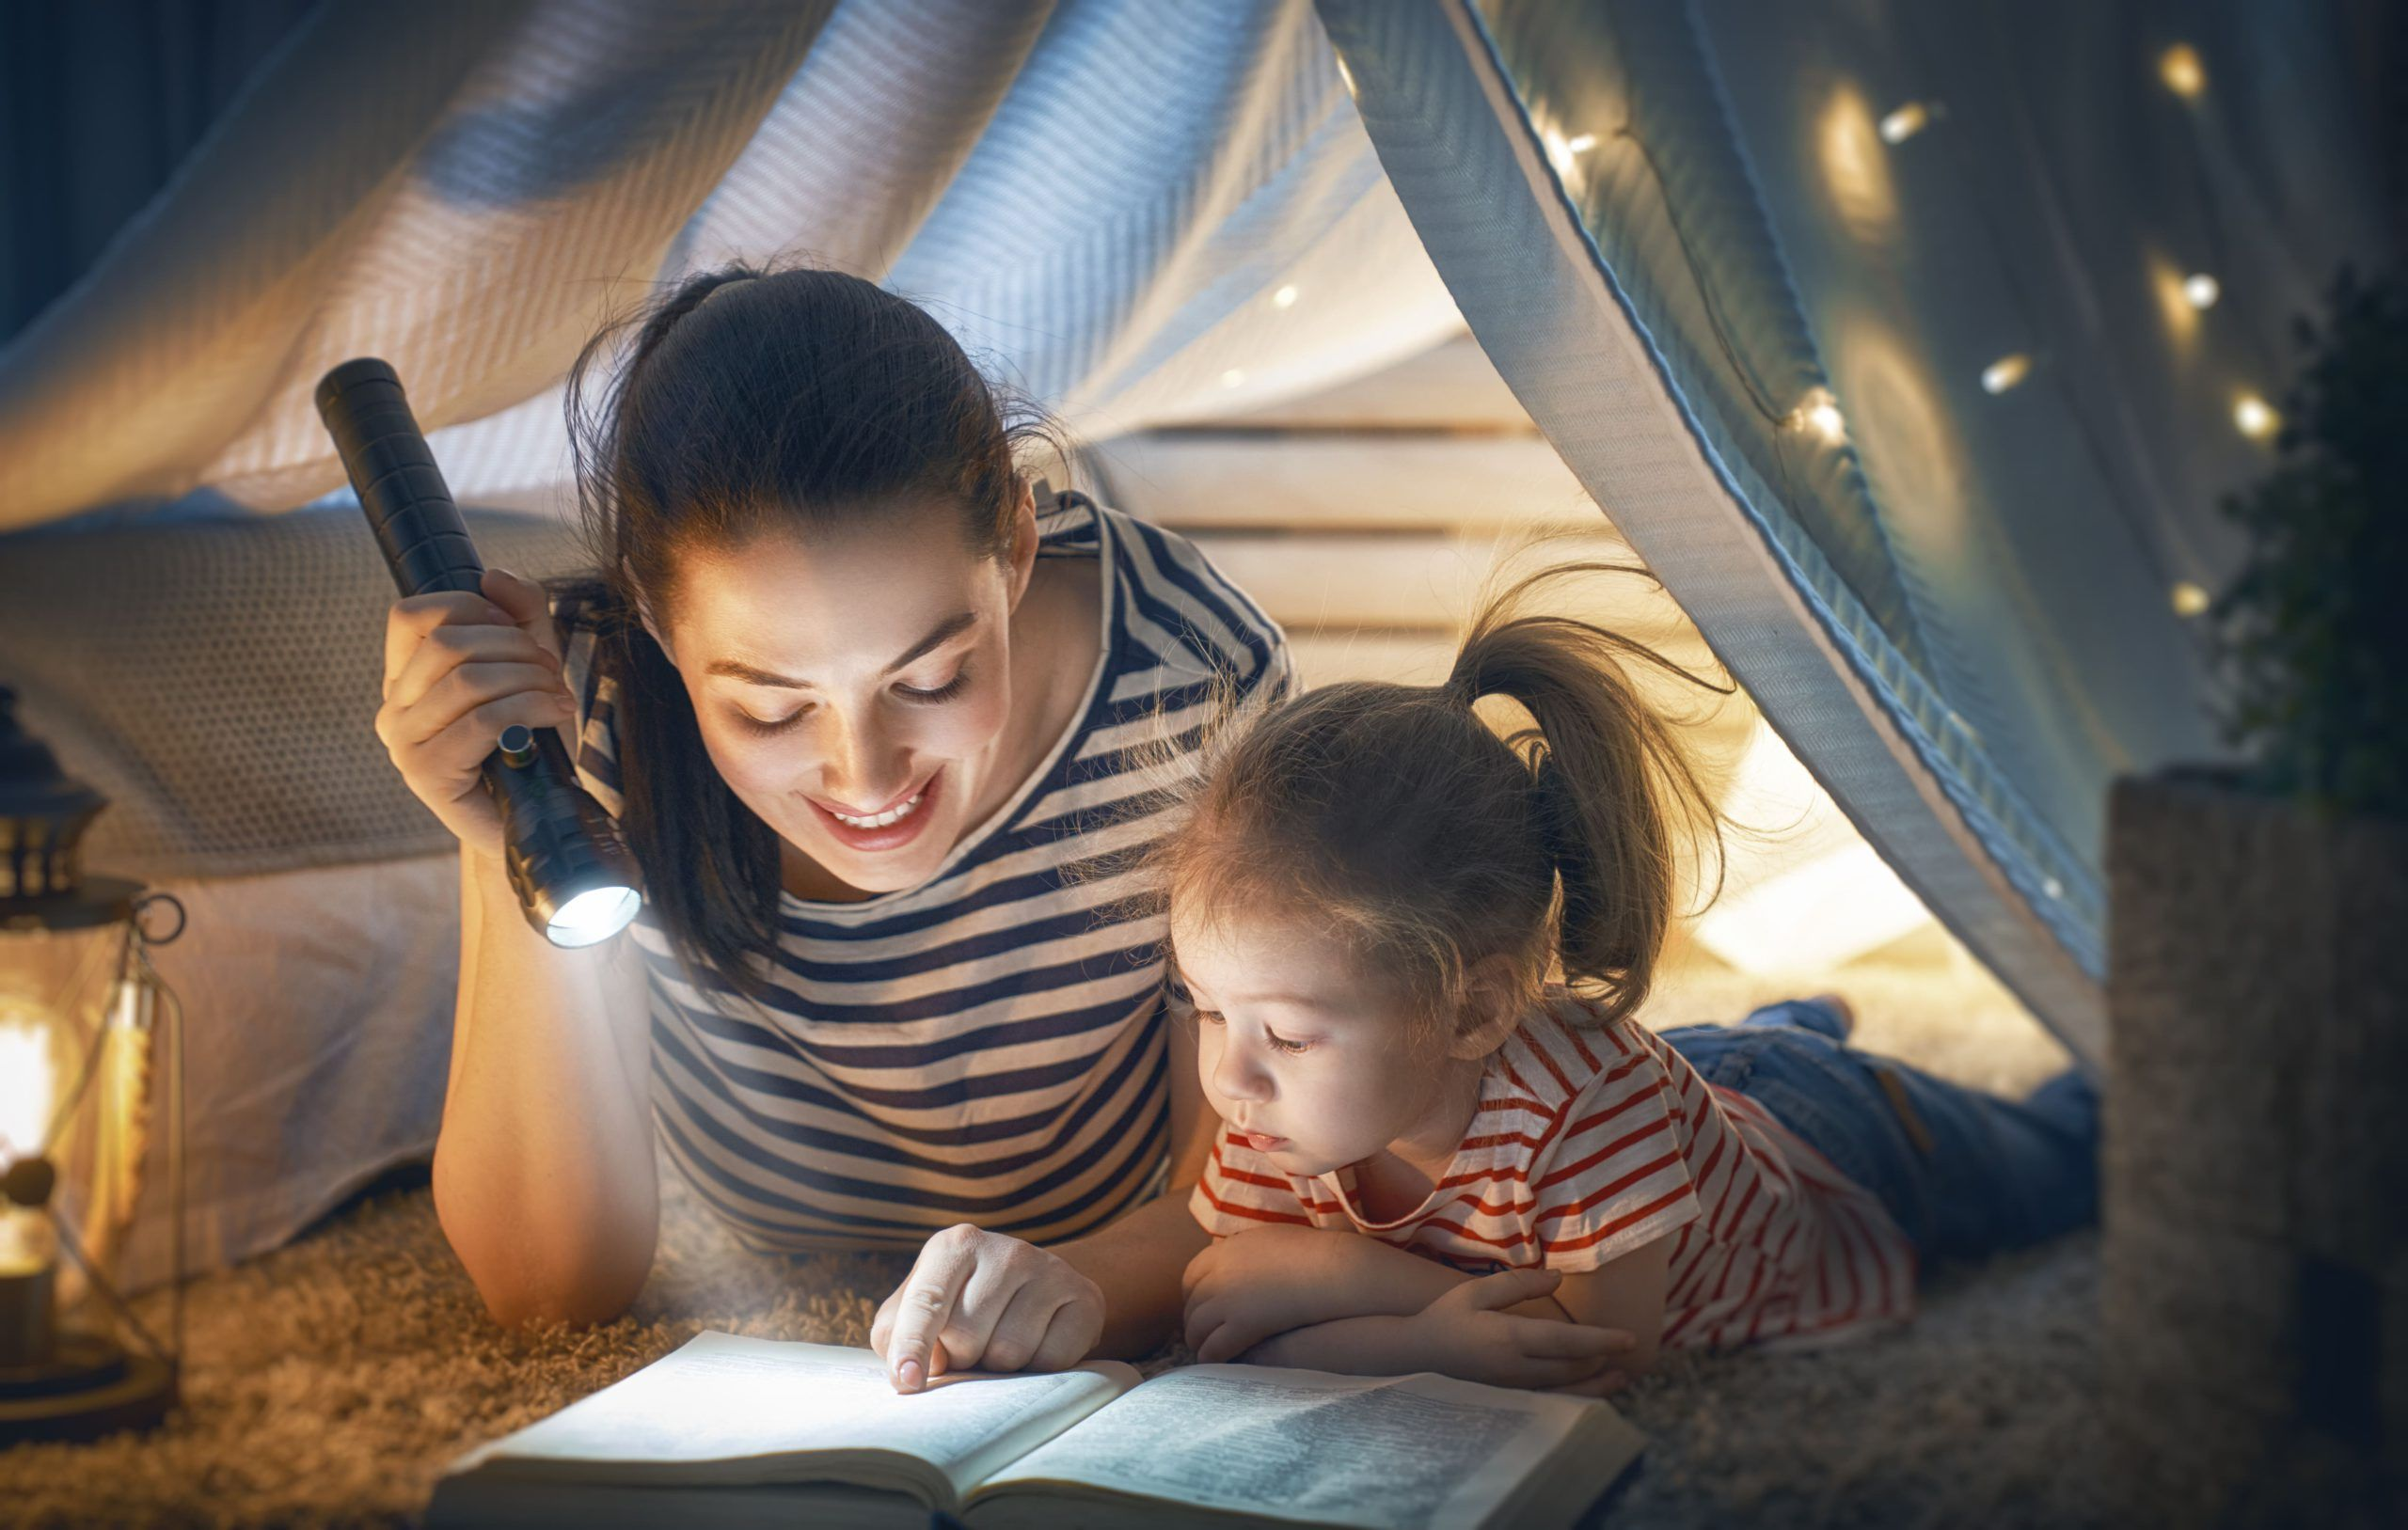 mom-and-child-reading-book-2XSMHNJ-min